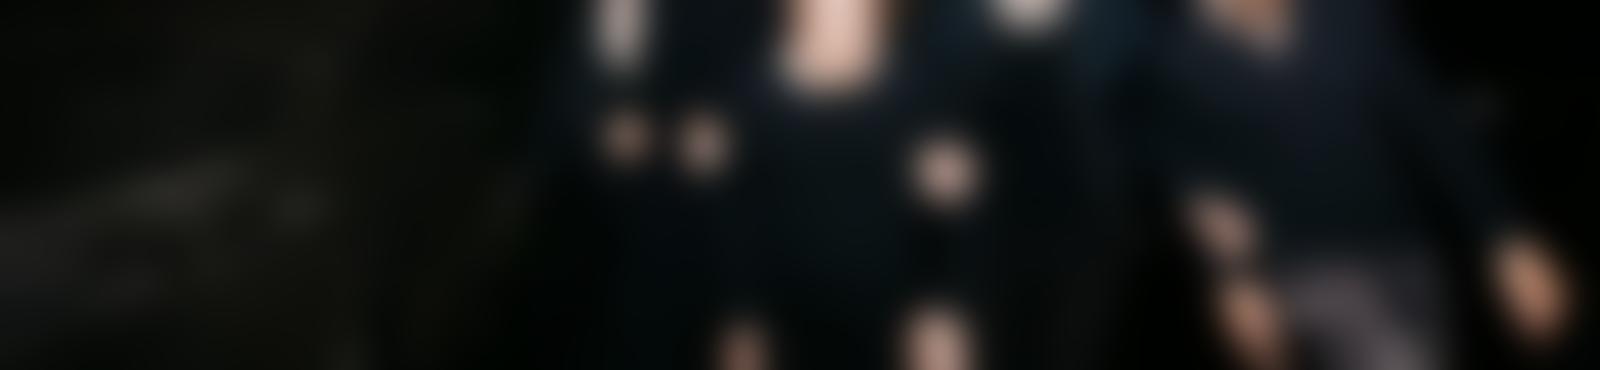 Blurred 20240d21 0711 477b 914c 4f8a50560af8